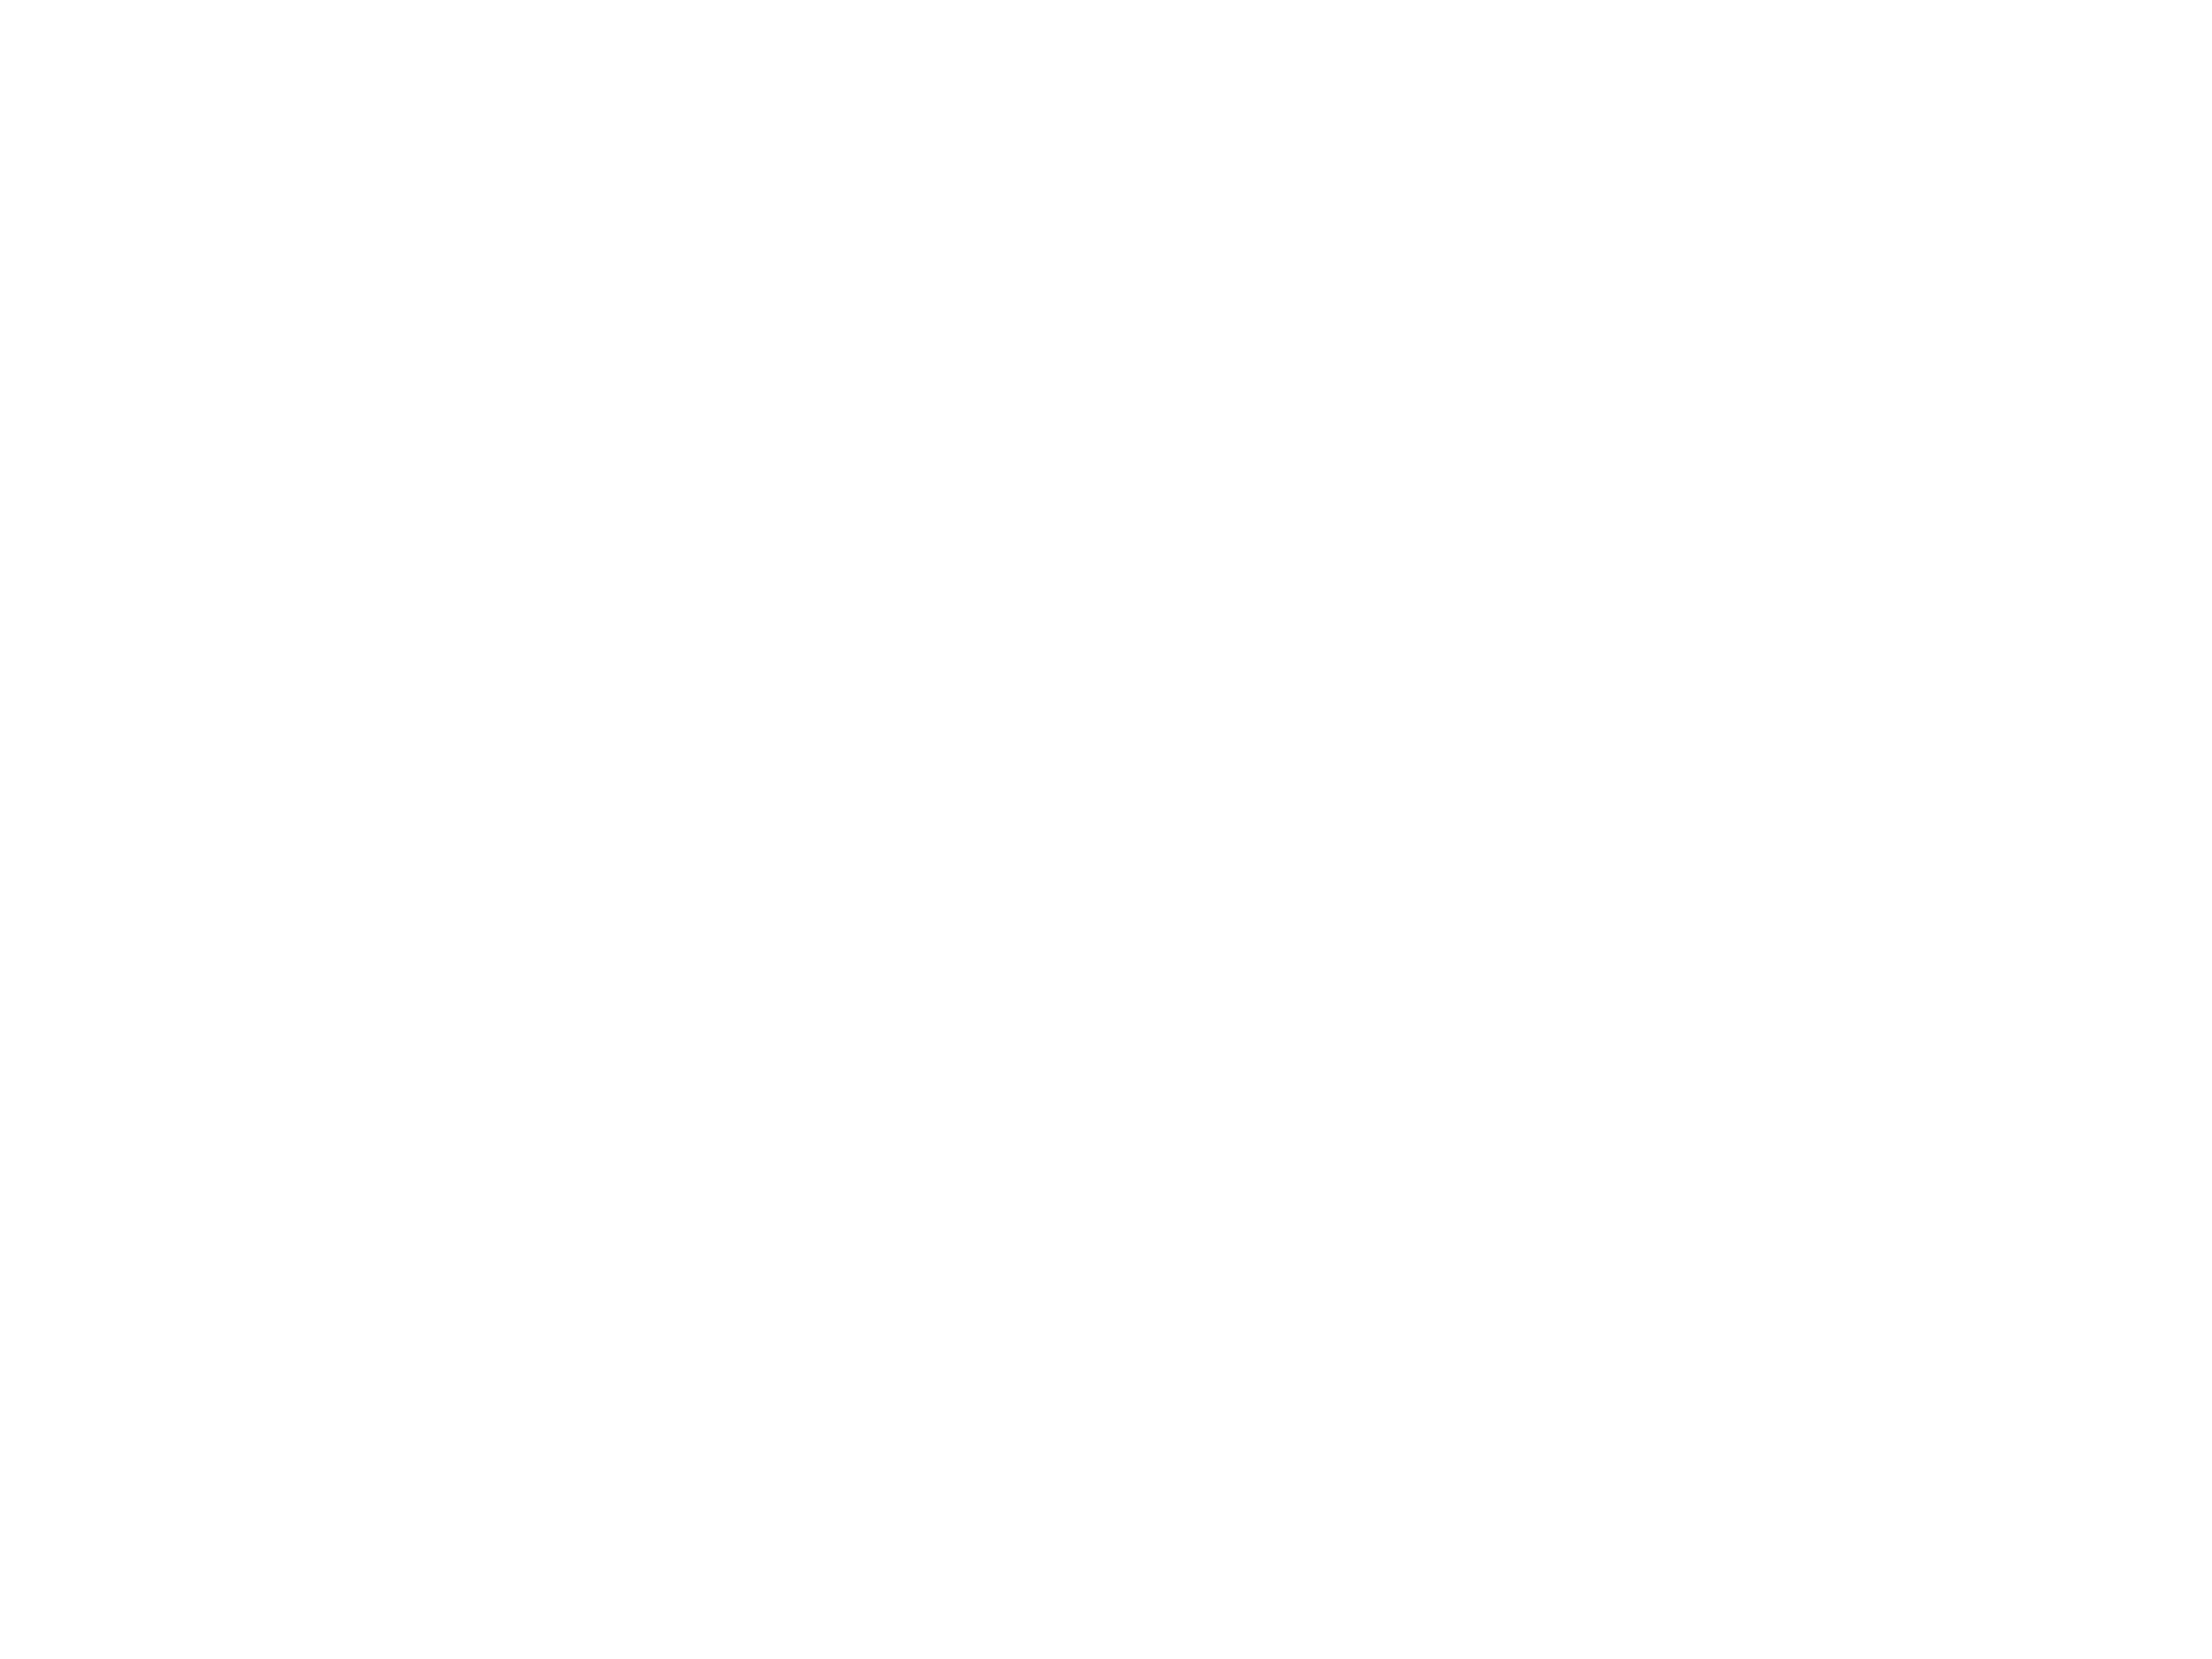 CARRONA - AUTOKINO BERLIN